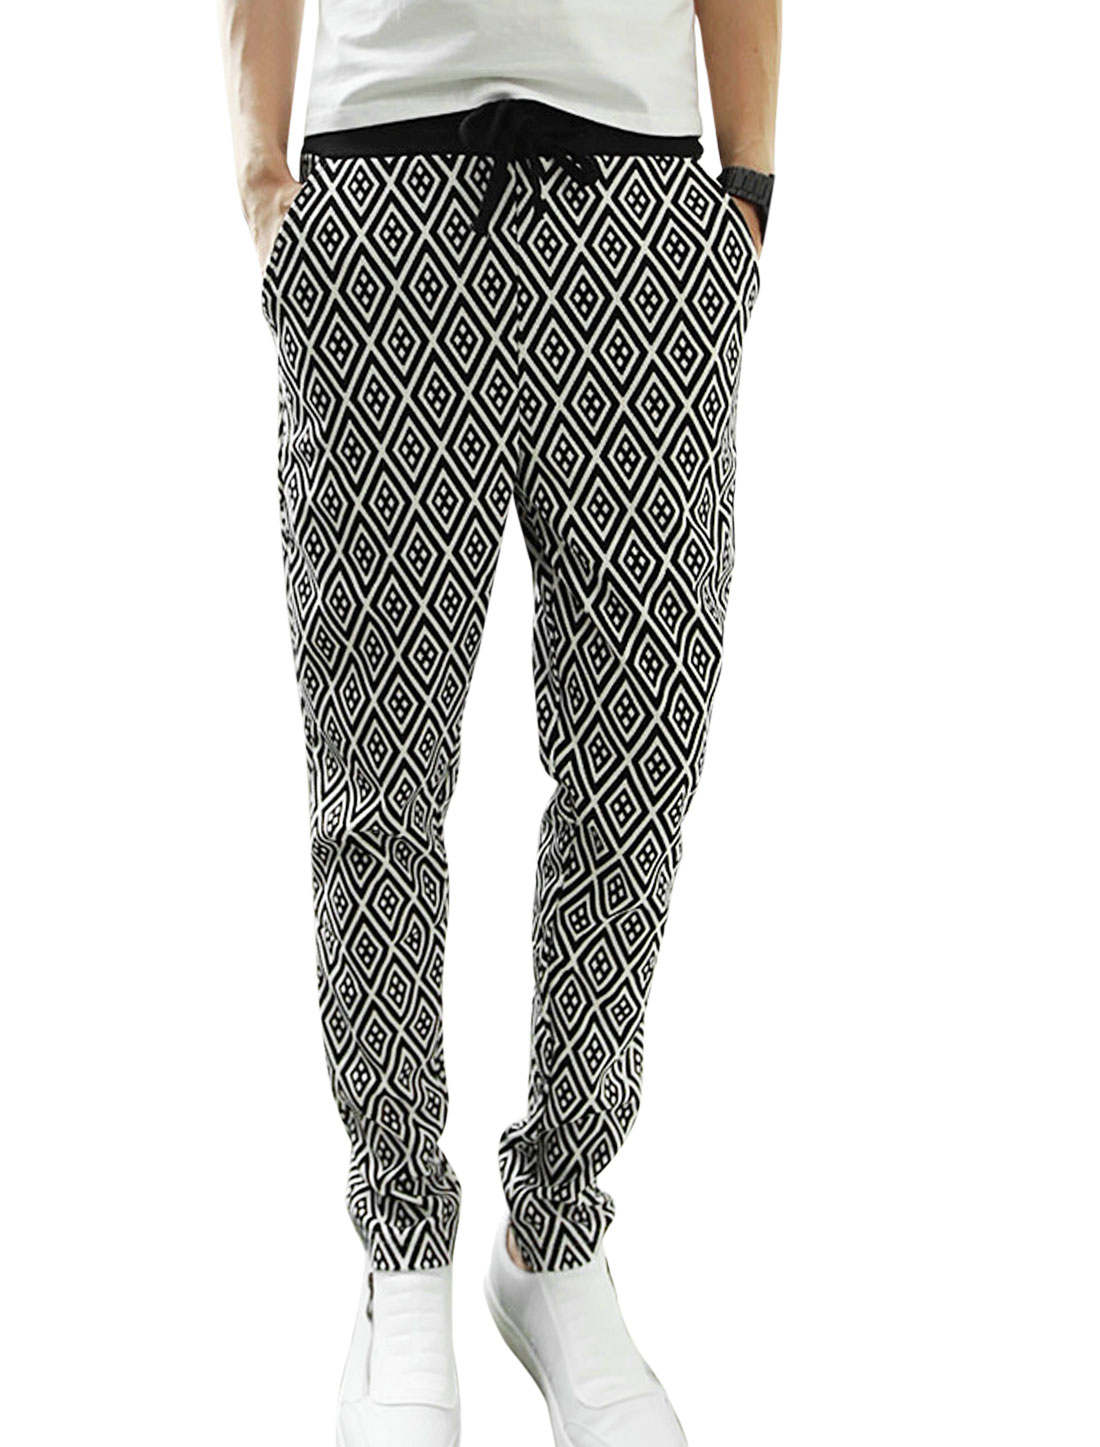 Men Elastic Ribbed Waist Argyle Pattern Textured Design Casual Pants Black White W30